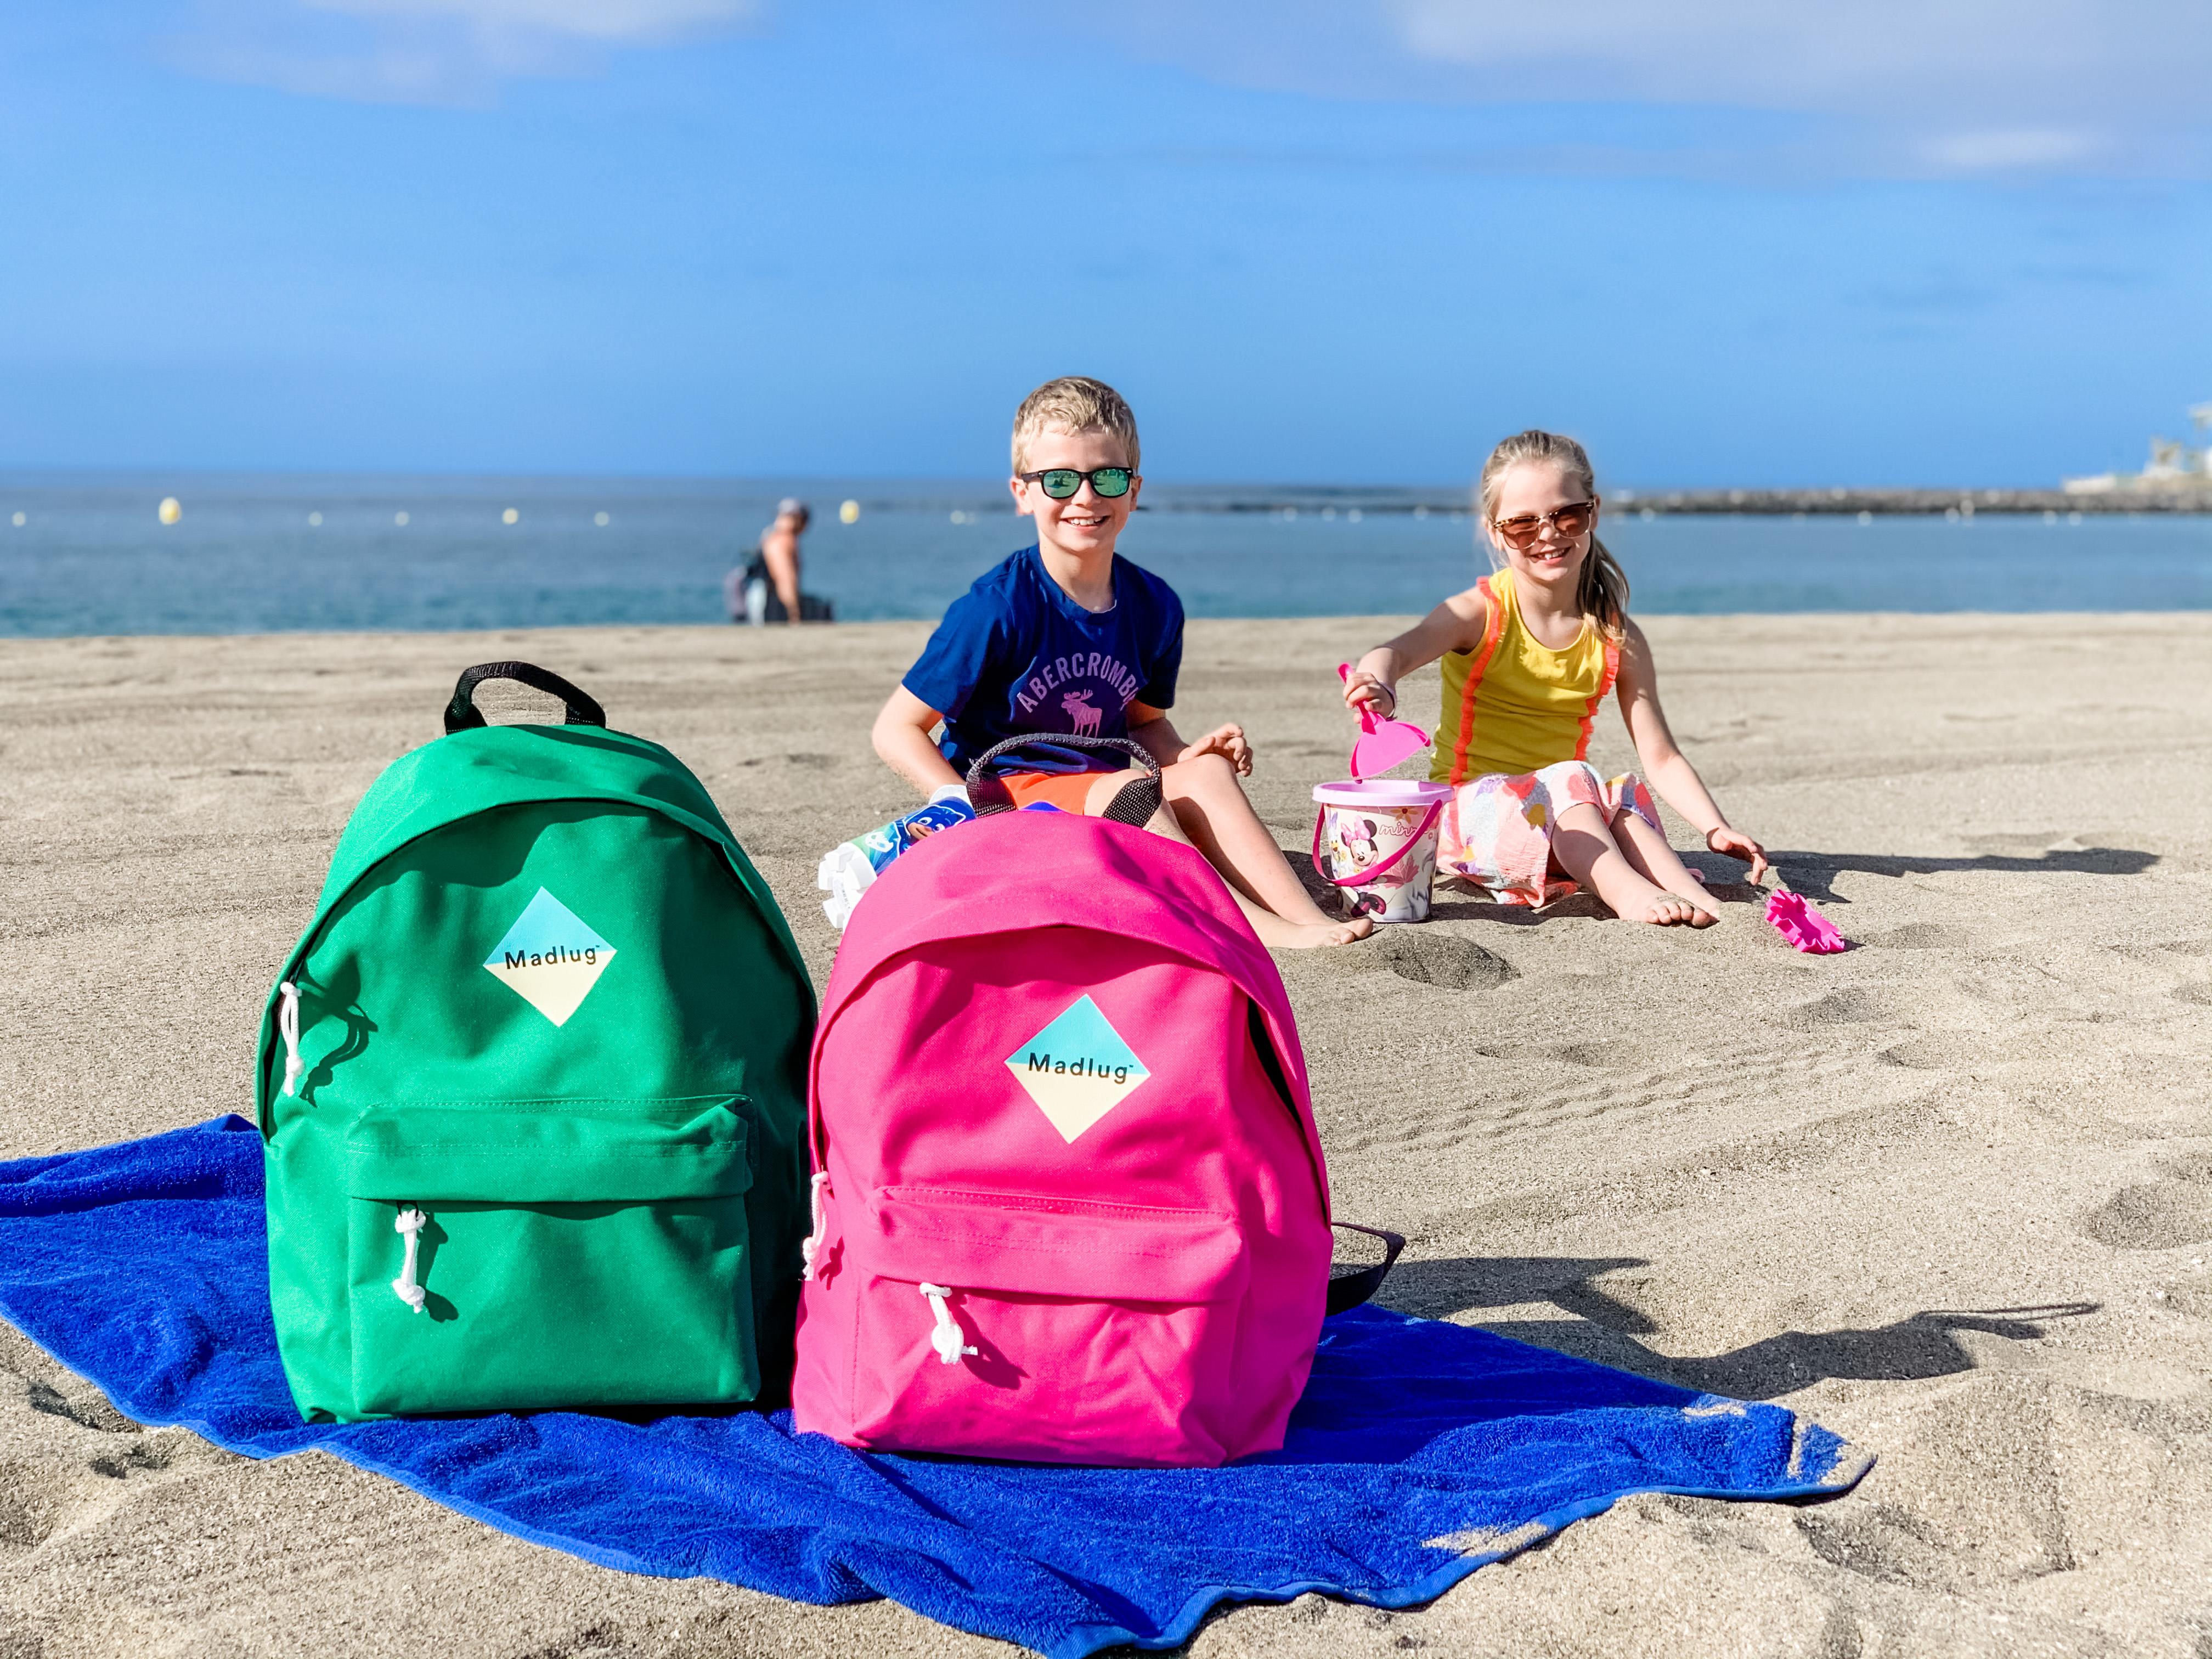 Madlug Backpacks Bags children in need bags